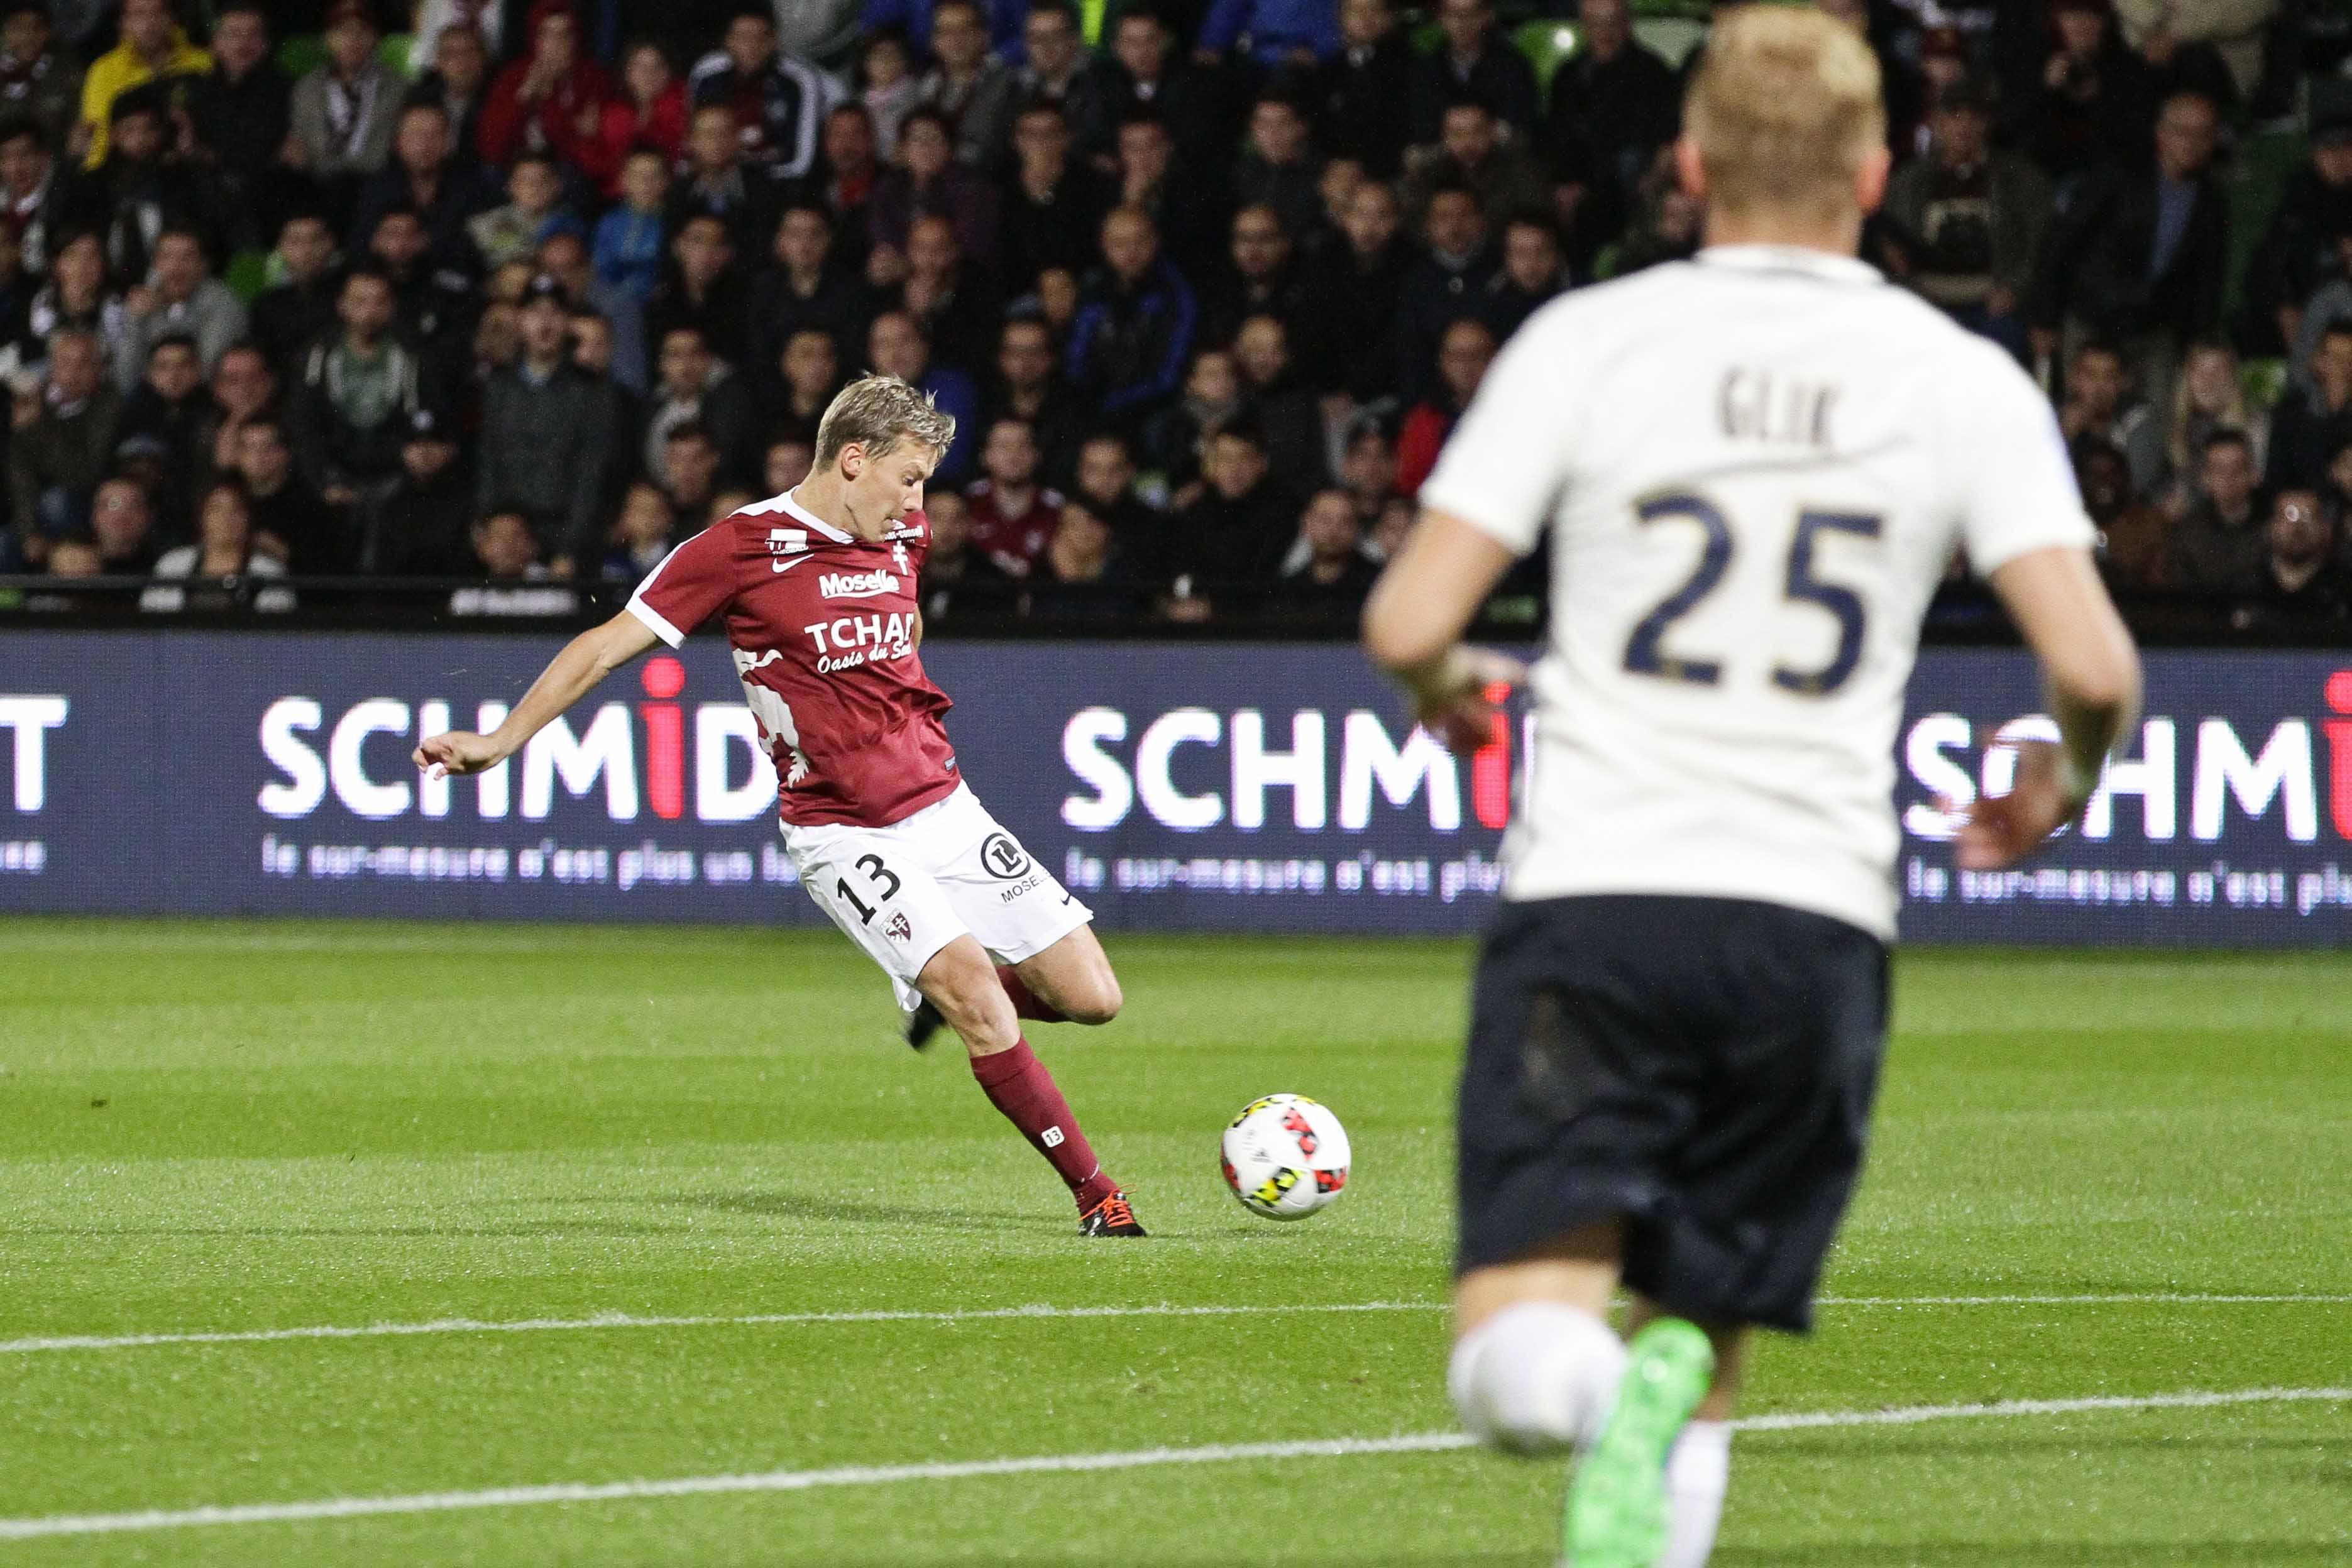 Football - Ligue 1 - Balayé 0-7 avec Metz, Signorino a vécu «la pire soirée de sa carrière»